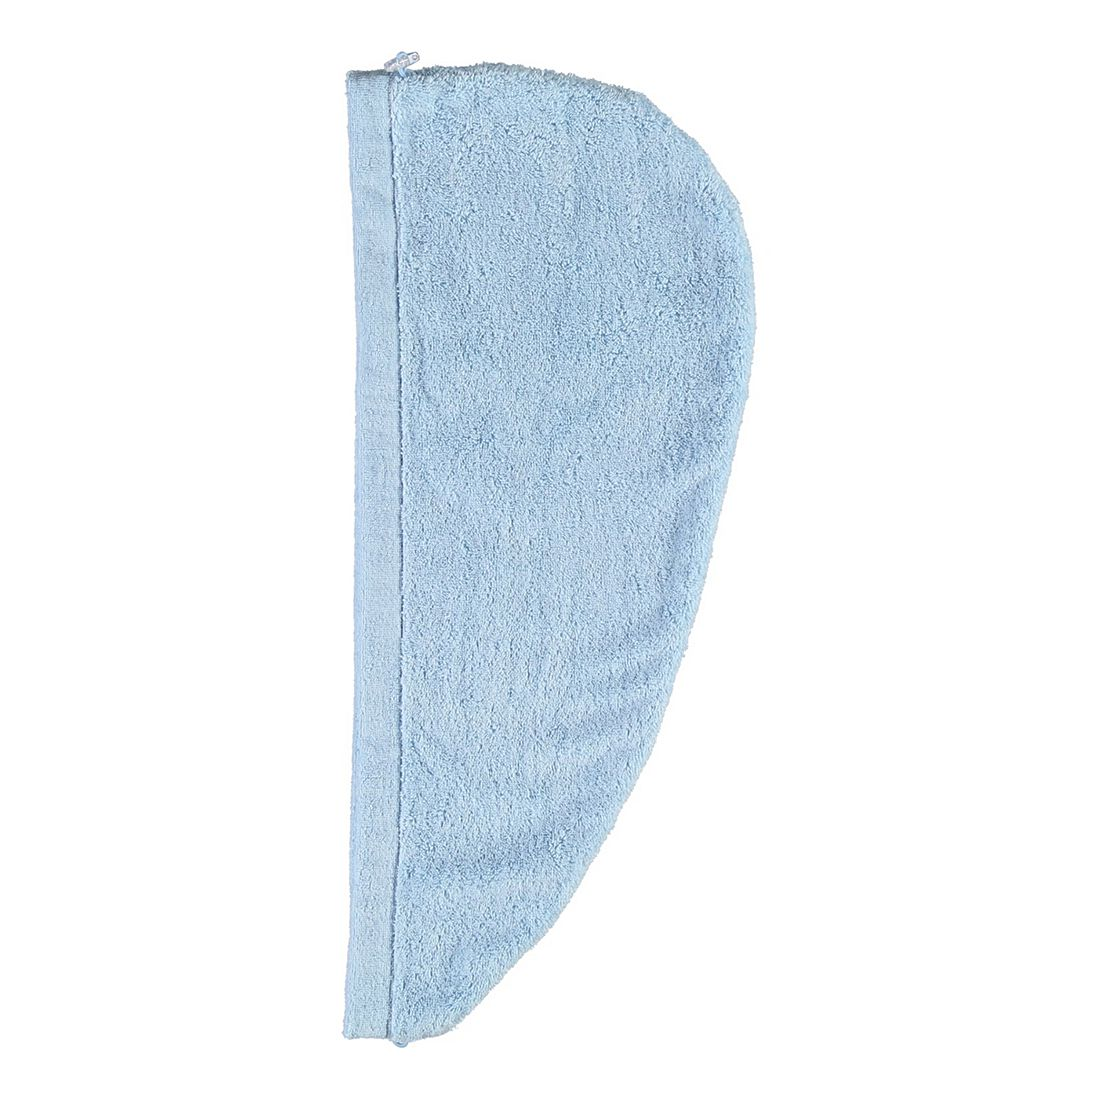 Turban 7073 – Frottier – 100% Baumwolle bleu – 192, Cawö jetzt bestellen